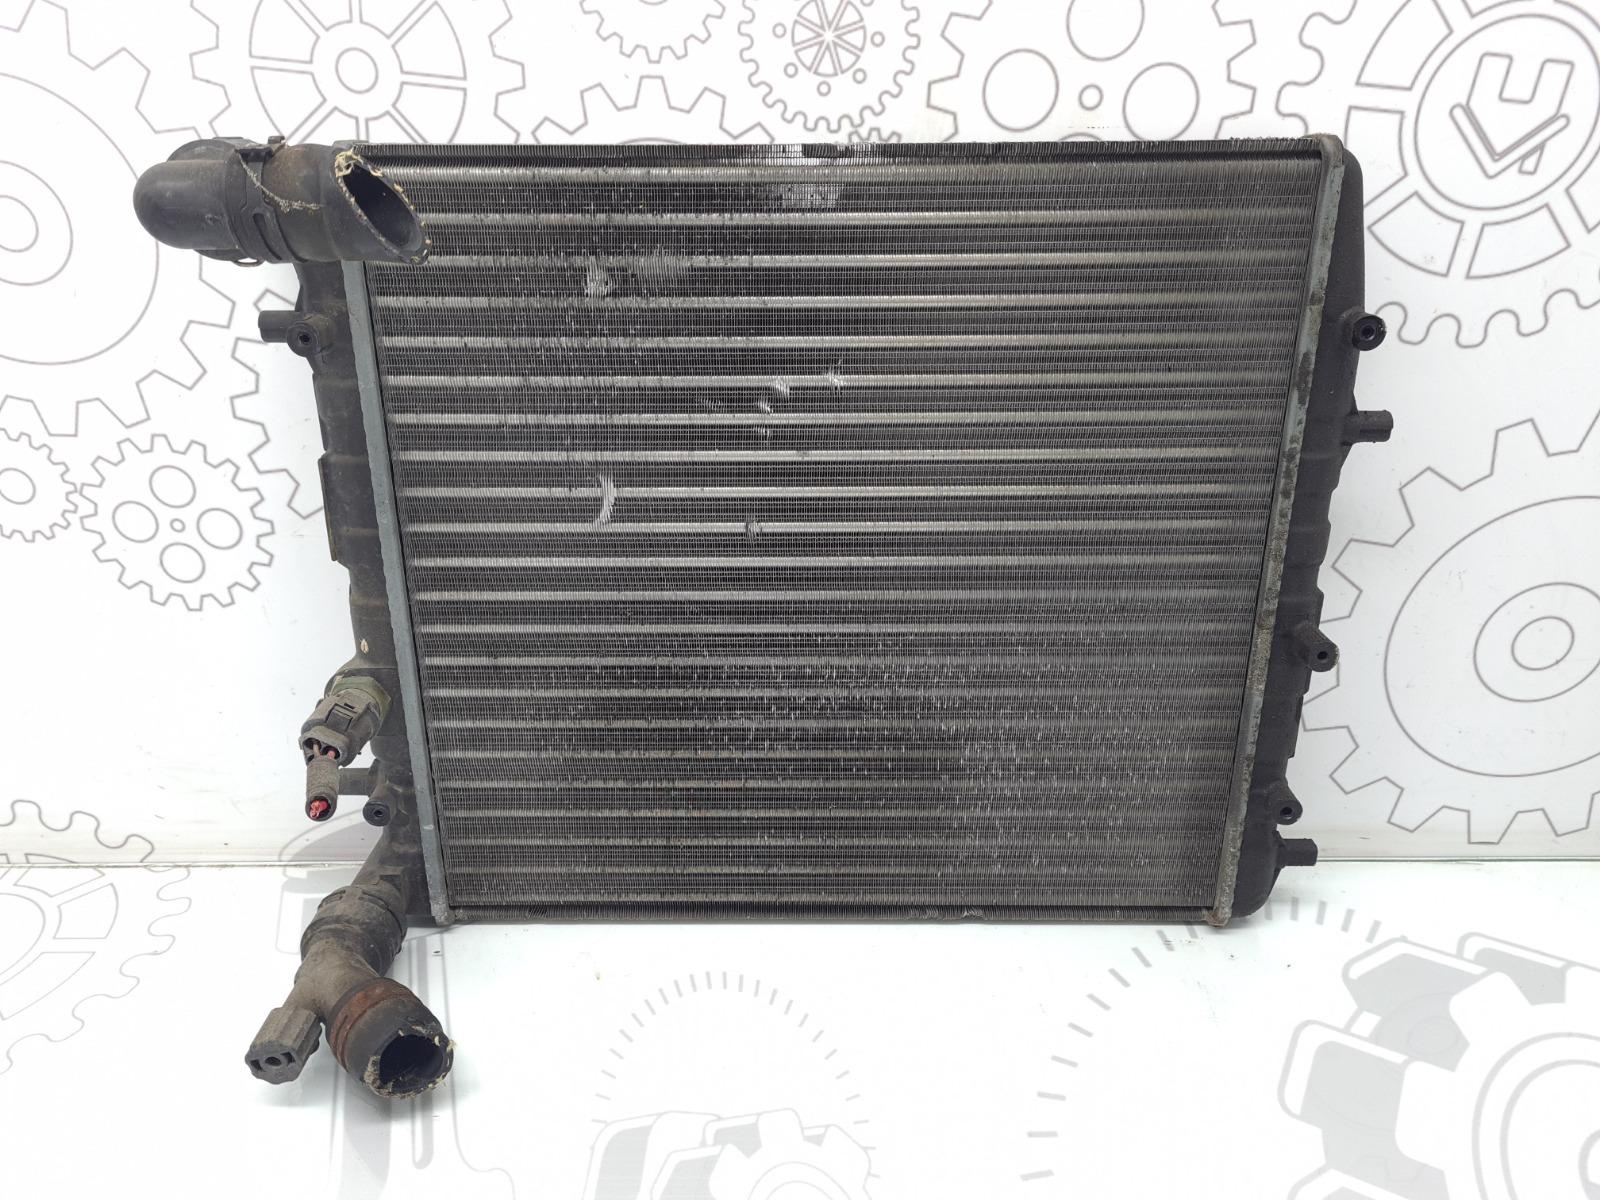 Радиатор (основной) Volkswagen Fox 1.2 I 2008 (б/у)